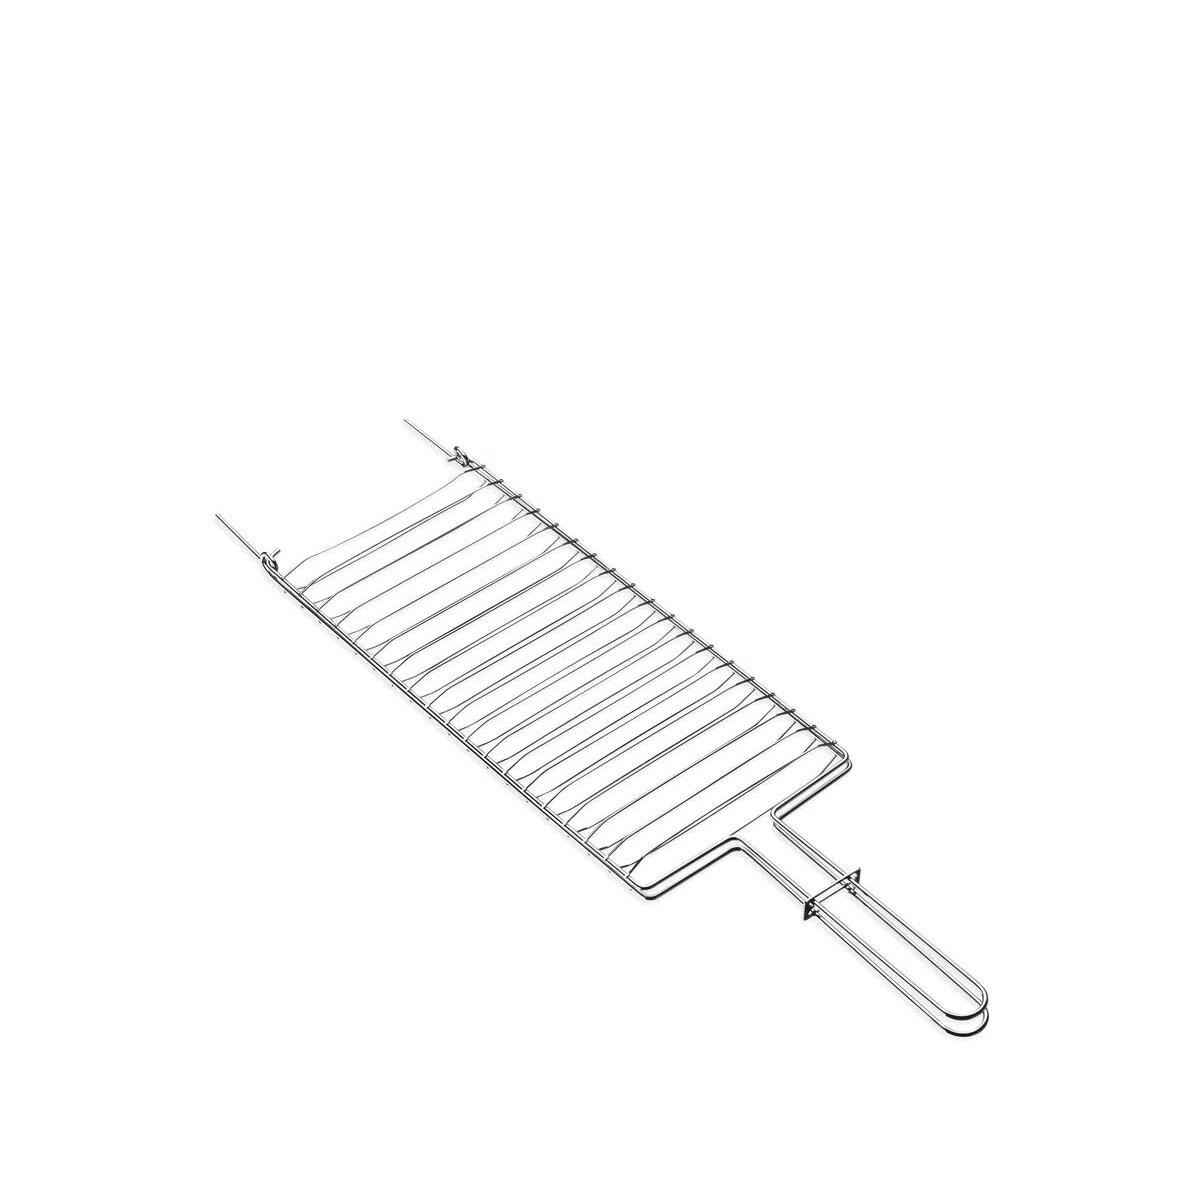 Grelha Plana Aço Inox 56 x 16 cm Tramontina